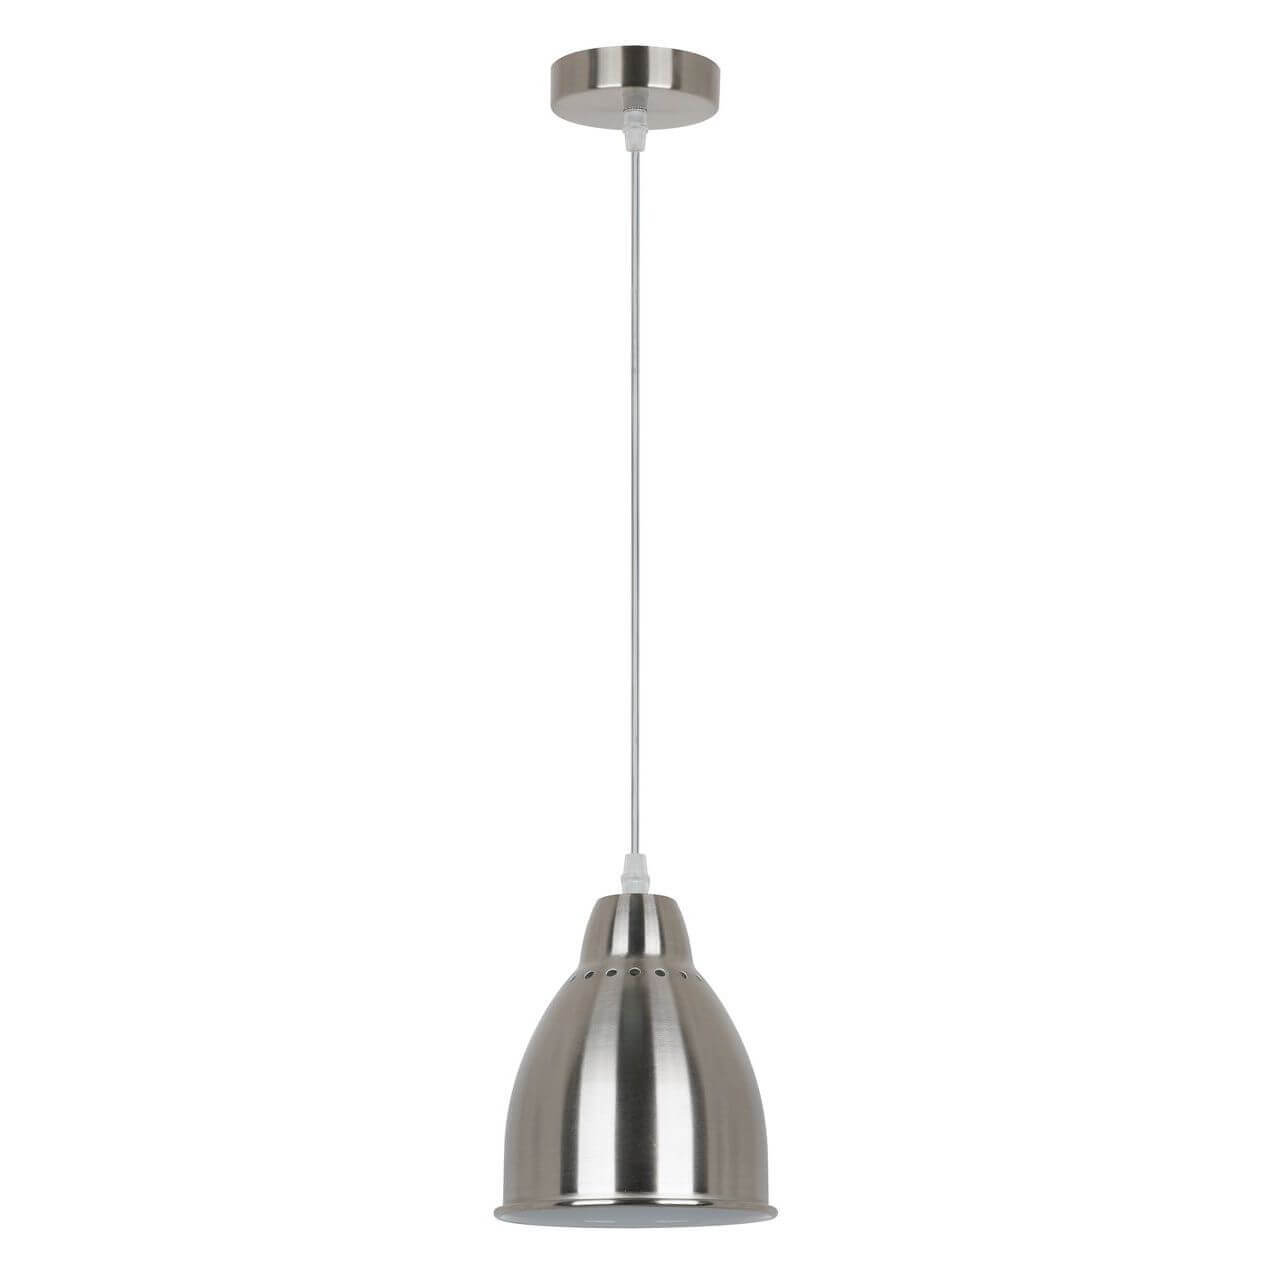 Светильник Arte Lamp A2054SP-1SS 43 Chrome светильник fametto dls l127 2001 luciole chrome glass